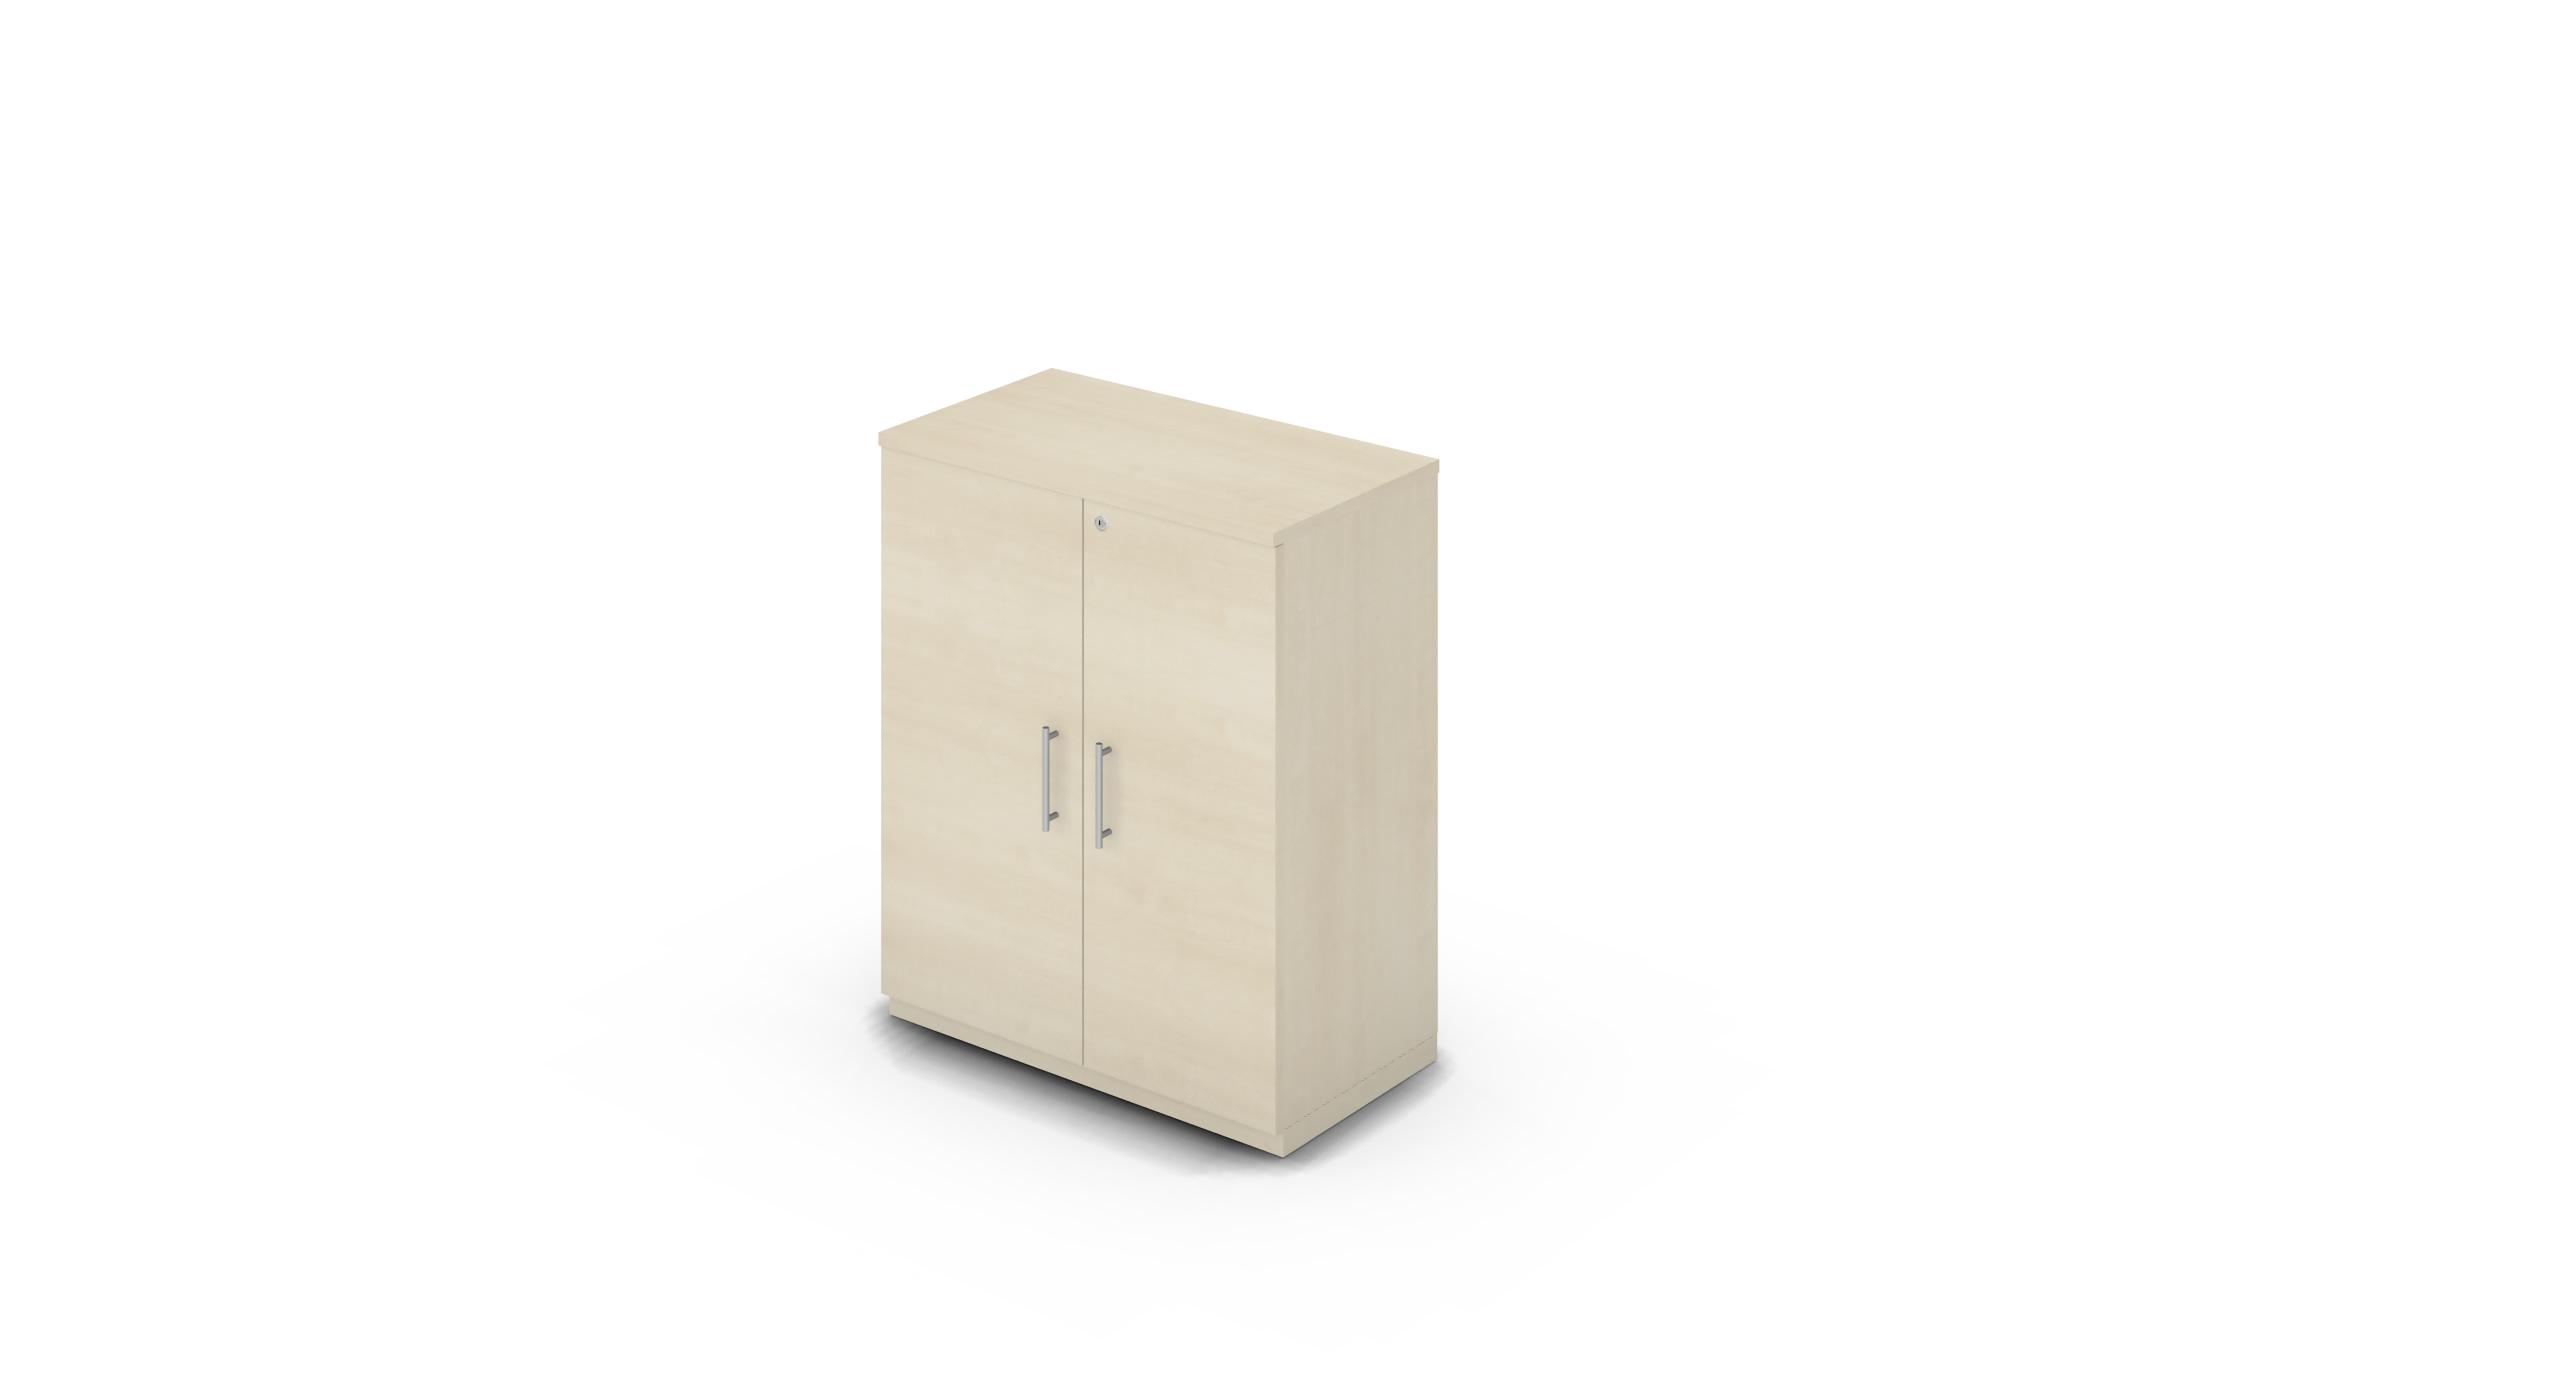 Cabinet_800x450x1125_HD_Maple_Bar_Round_WithCylinder